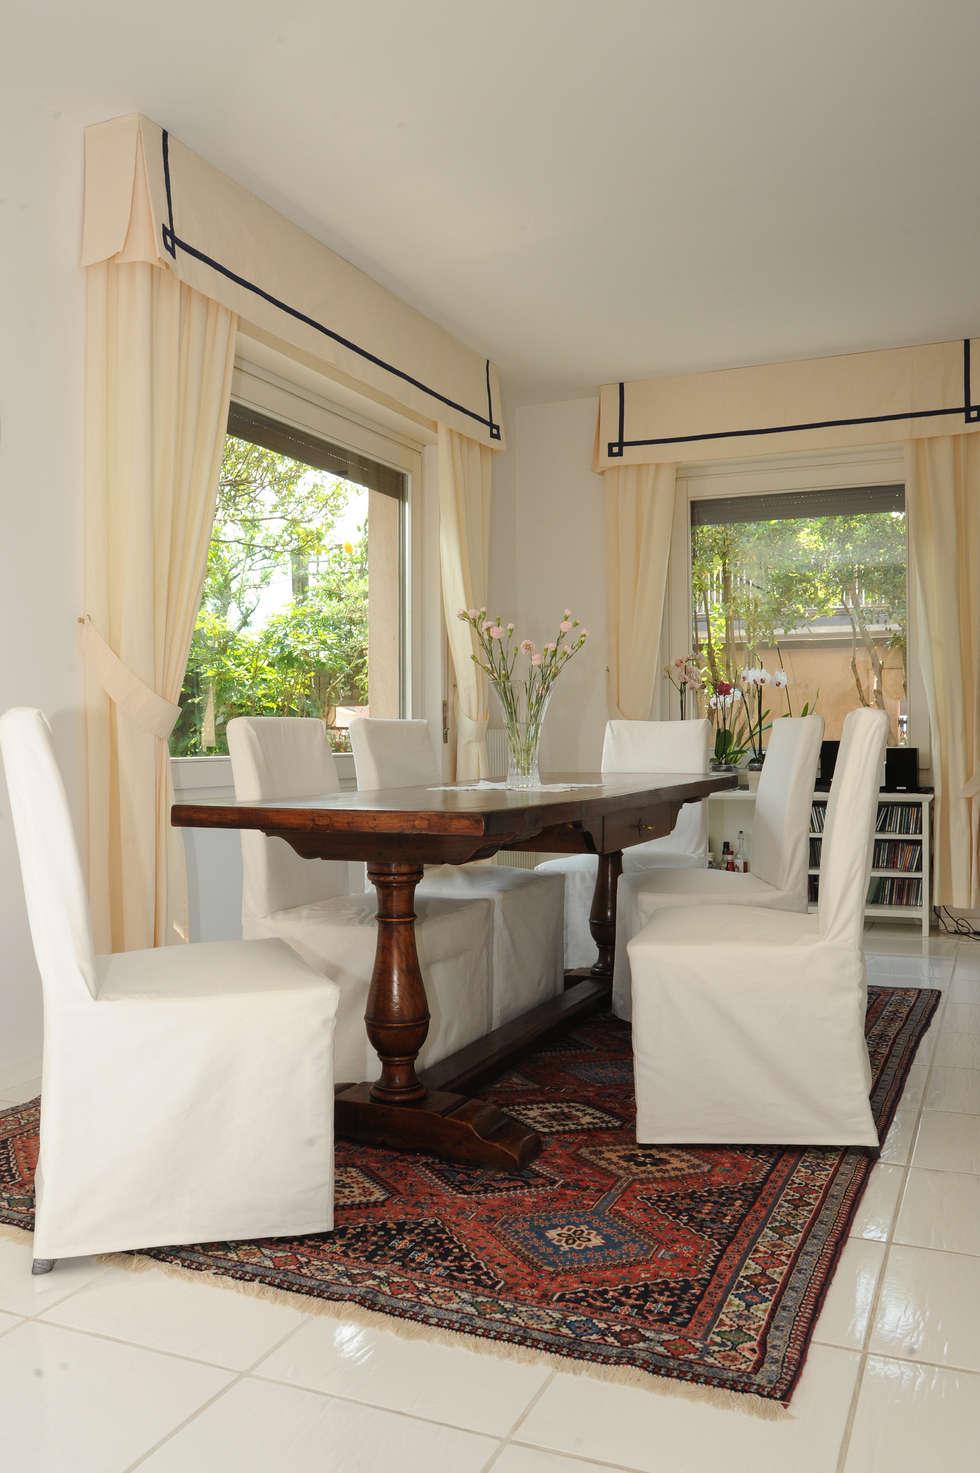 Idee arredamento casa interior design homify - Arredamento casa antica ...